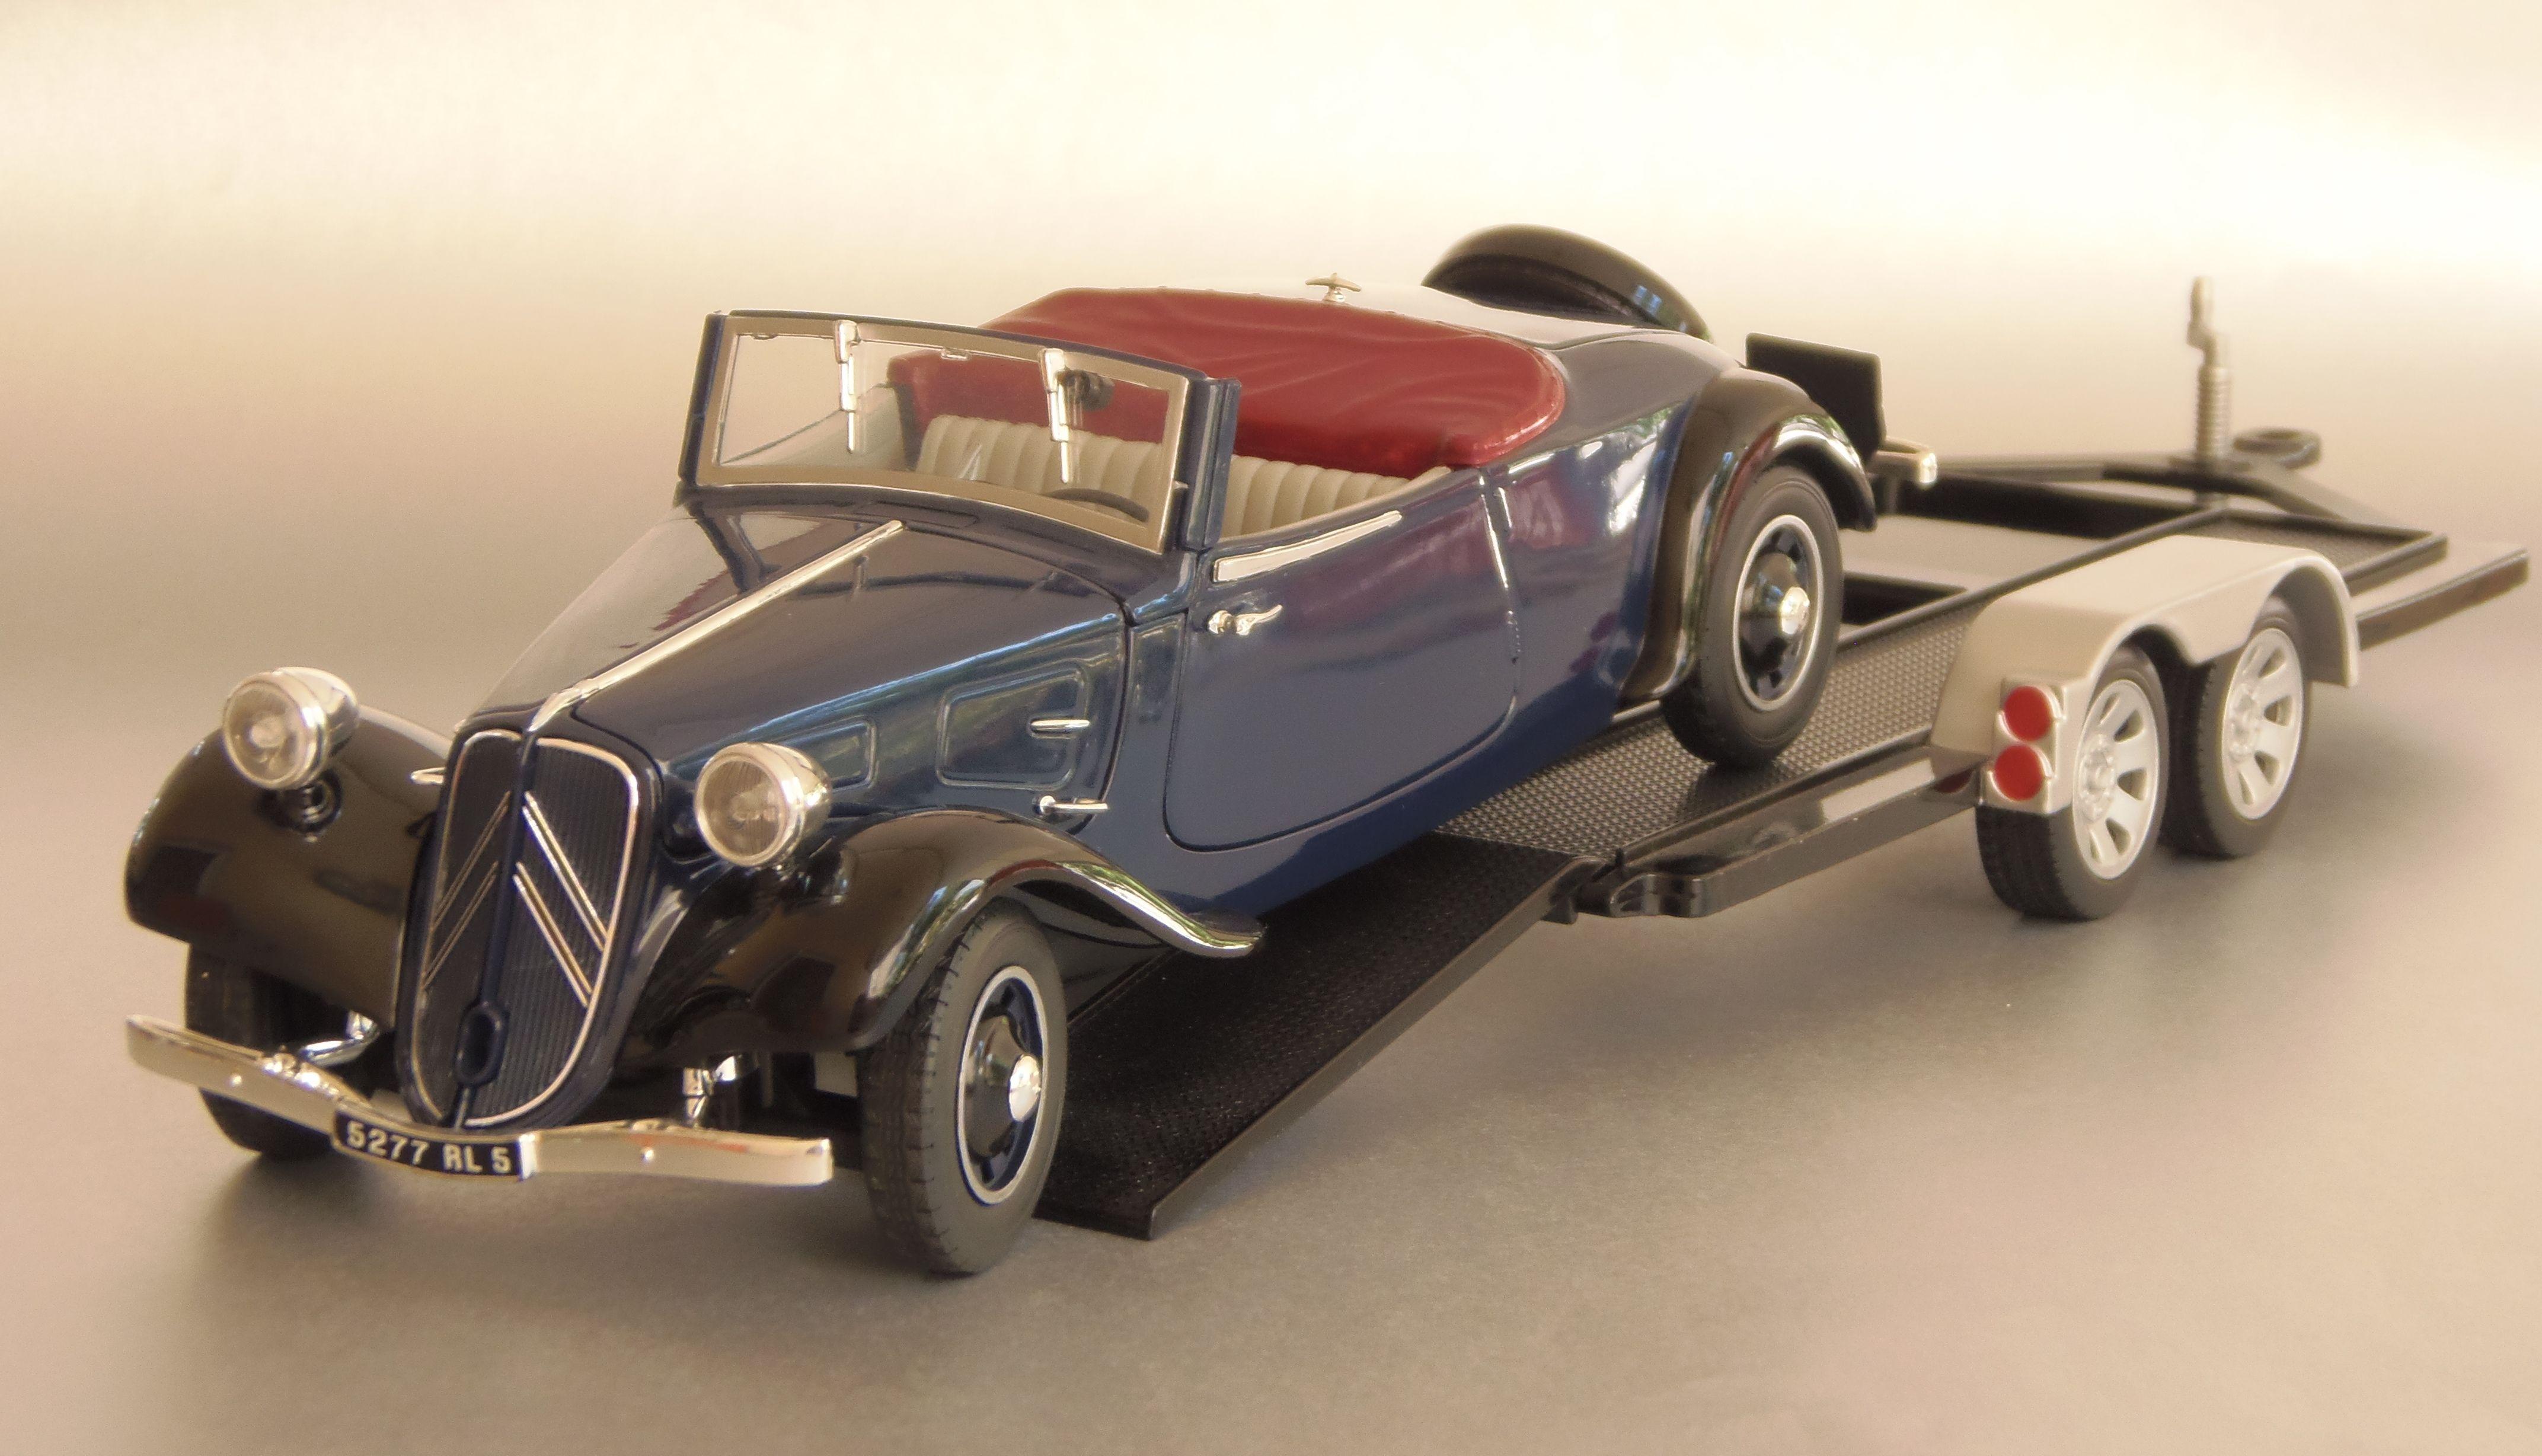 1938 Citroen Traction Type 11CV Cabriolet on Trailer